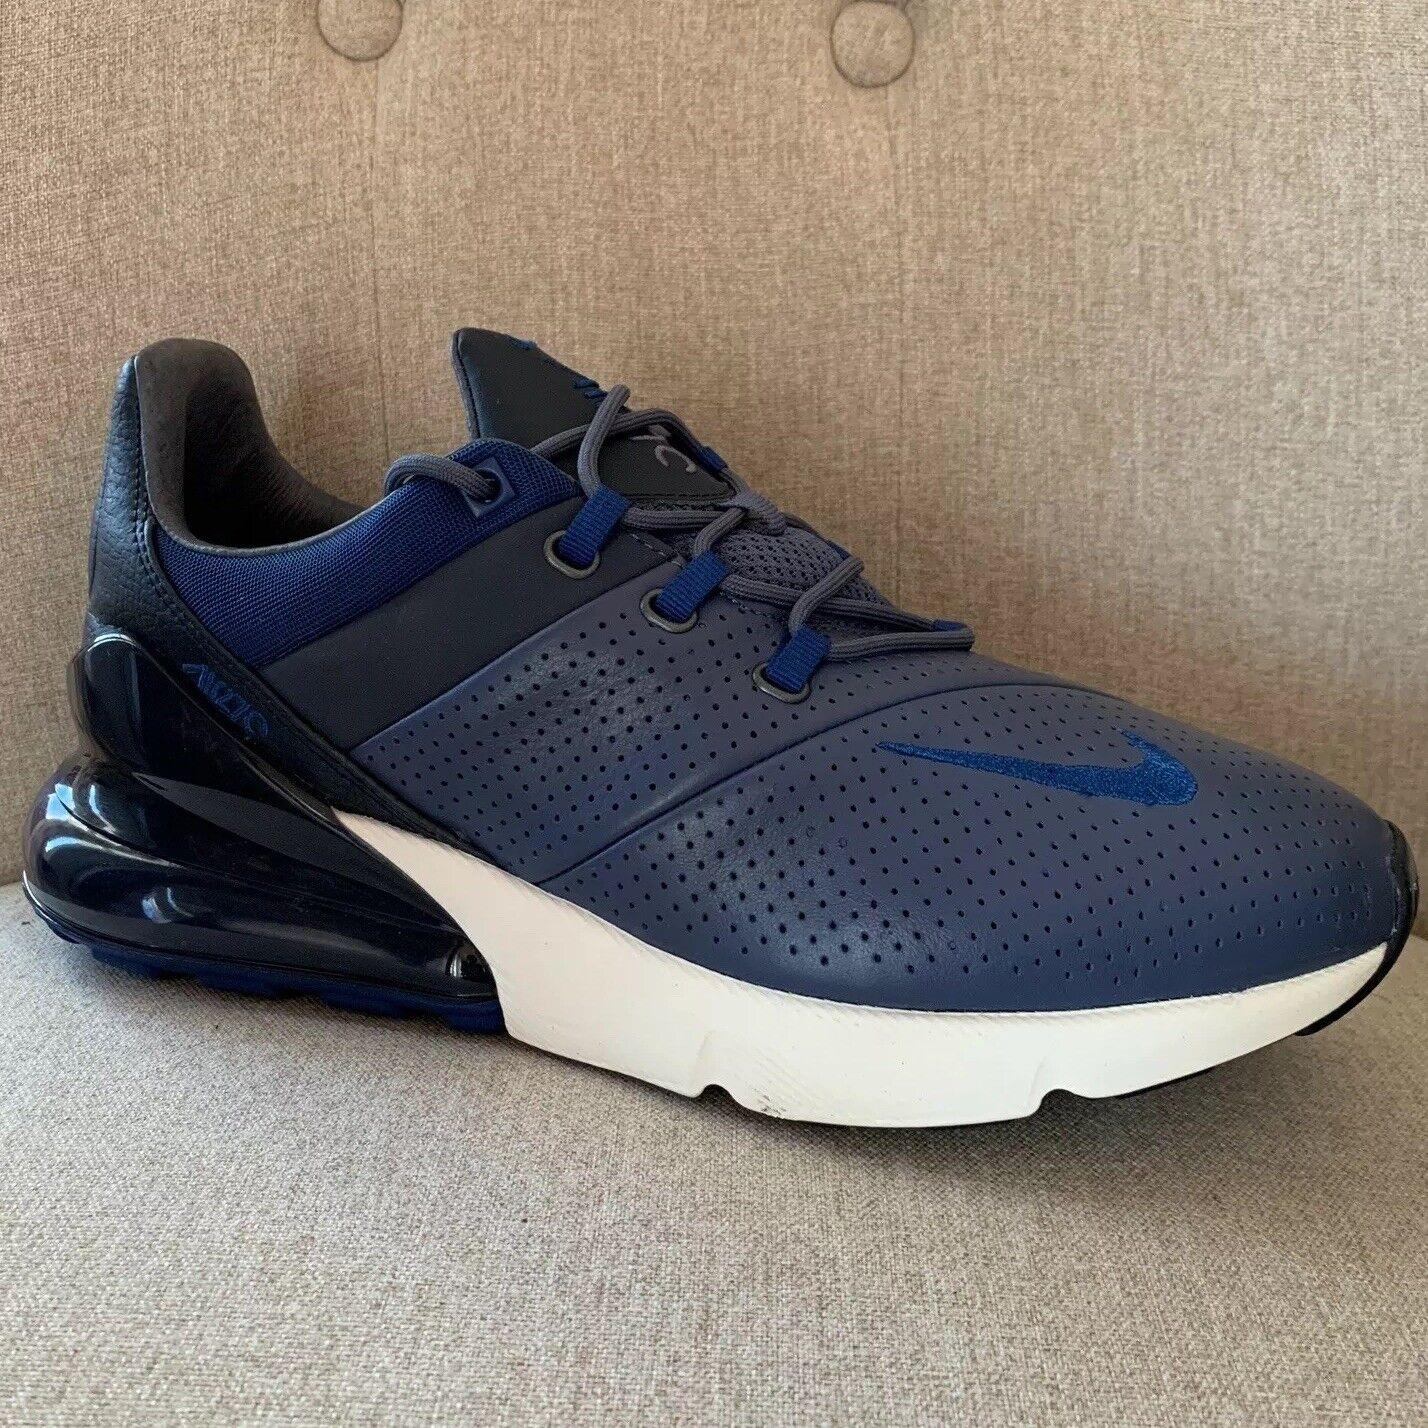 Zapatillas Nike Air Zoom Winflo 5 gris rojo